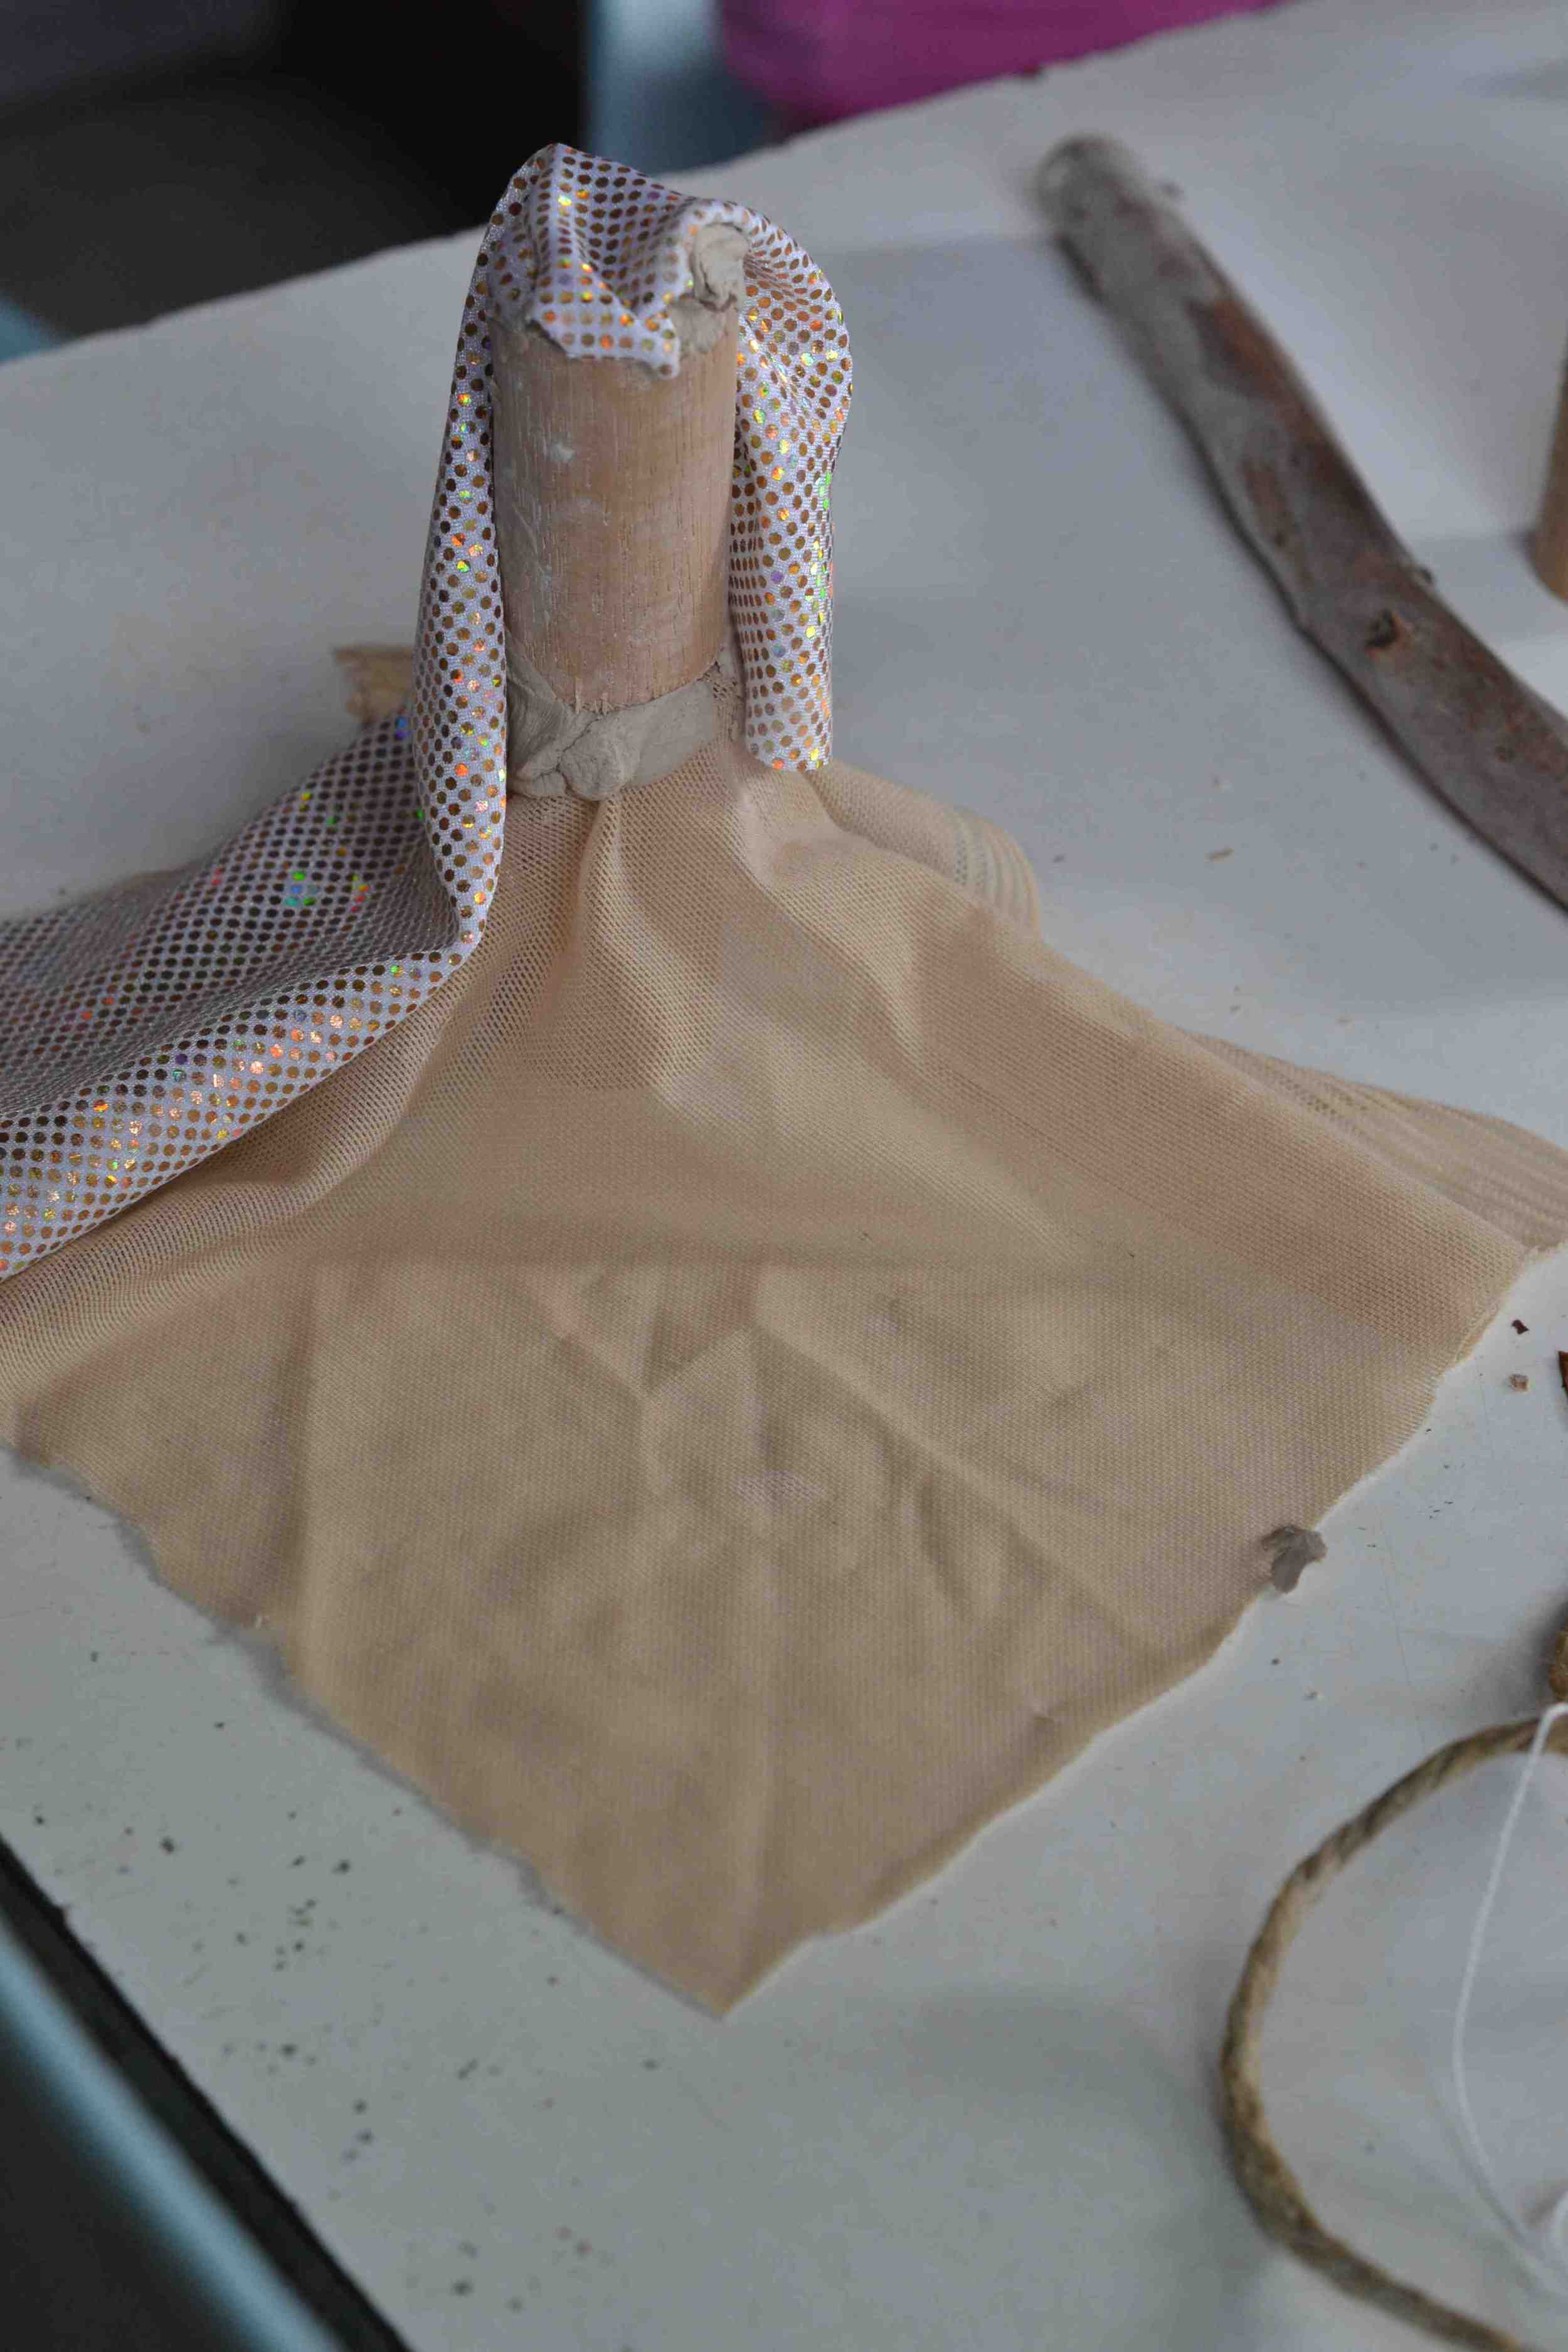 B: The glitter fabric returns